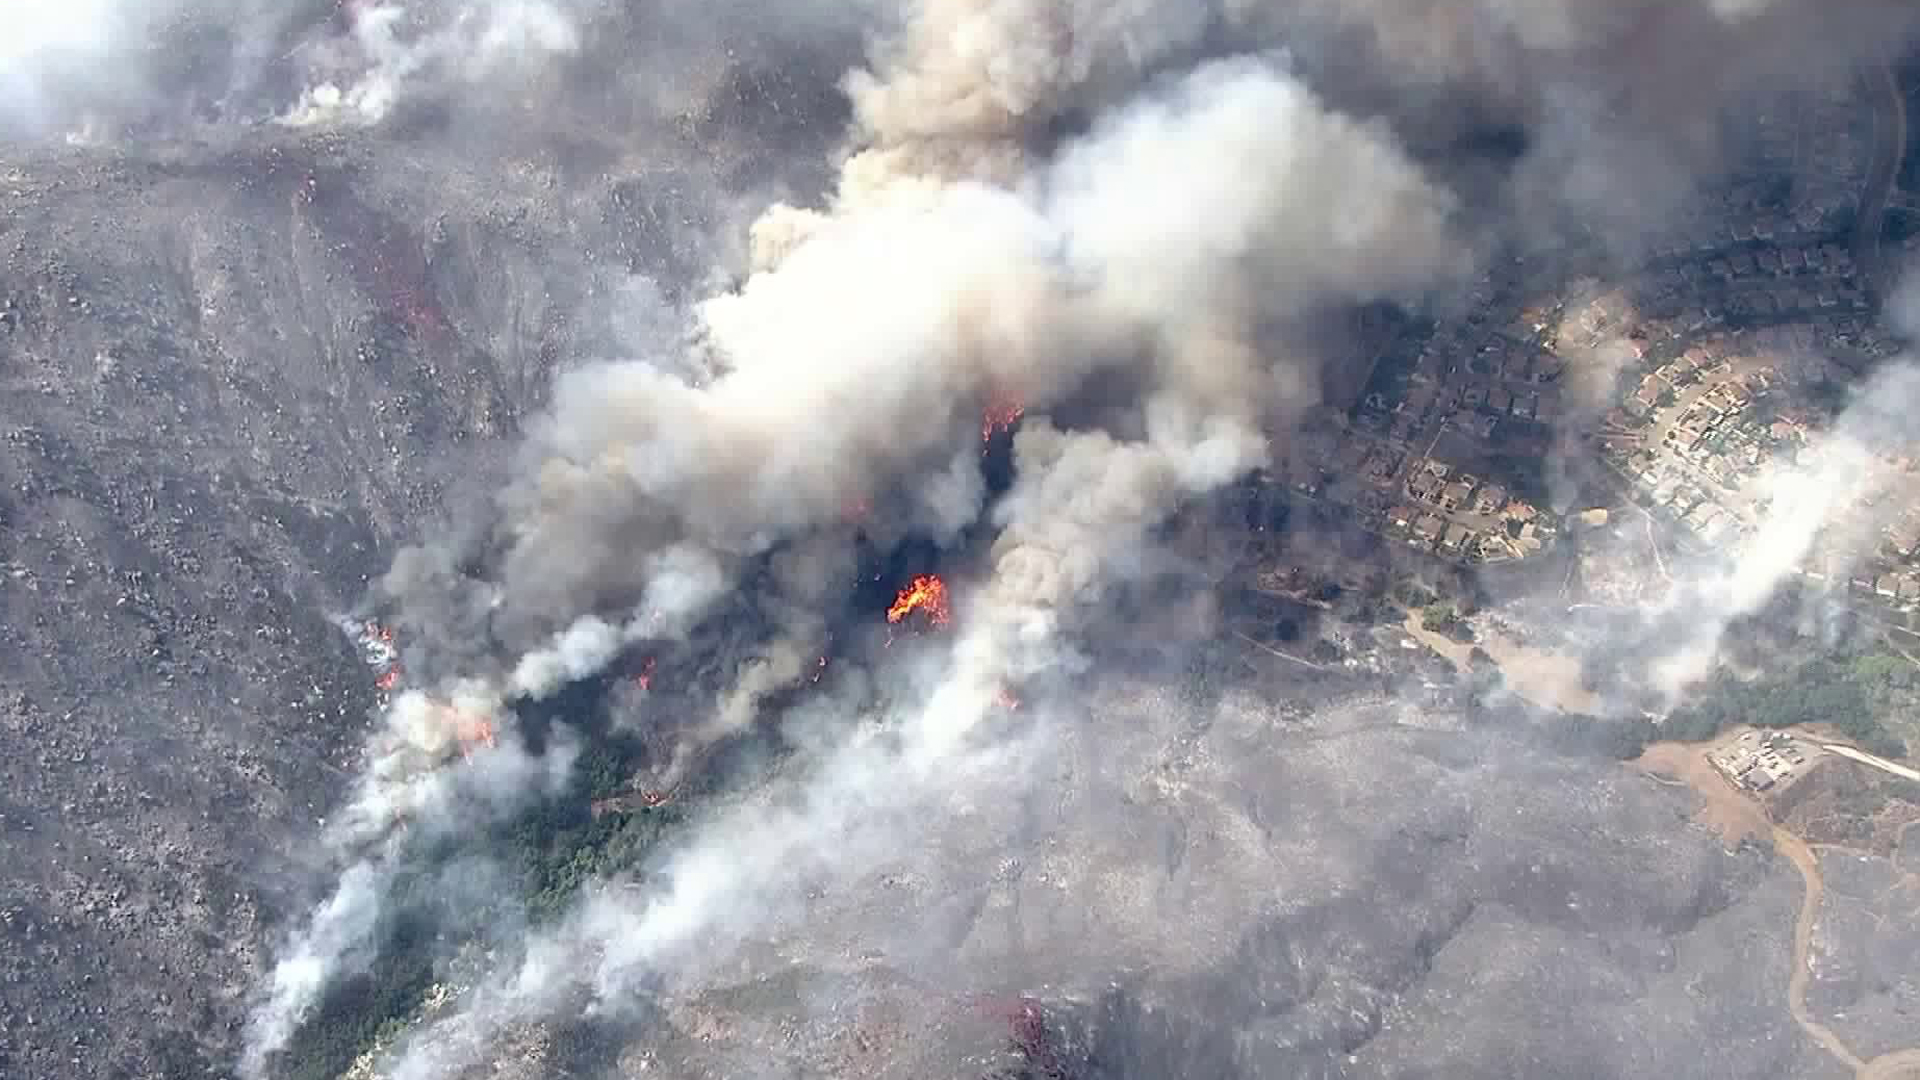 The Tenaja Fire burns dangerously close to homes in the Murrieta area on Sept. 5, 2019. (Credit: KTLA)